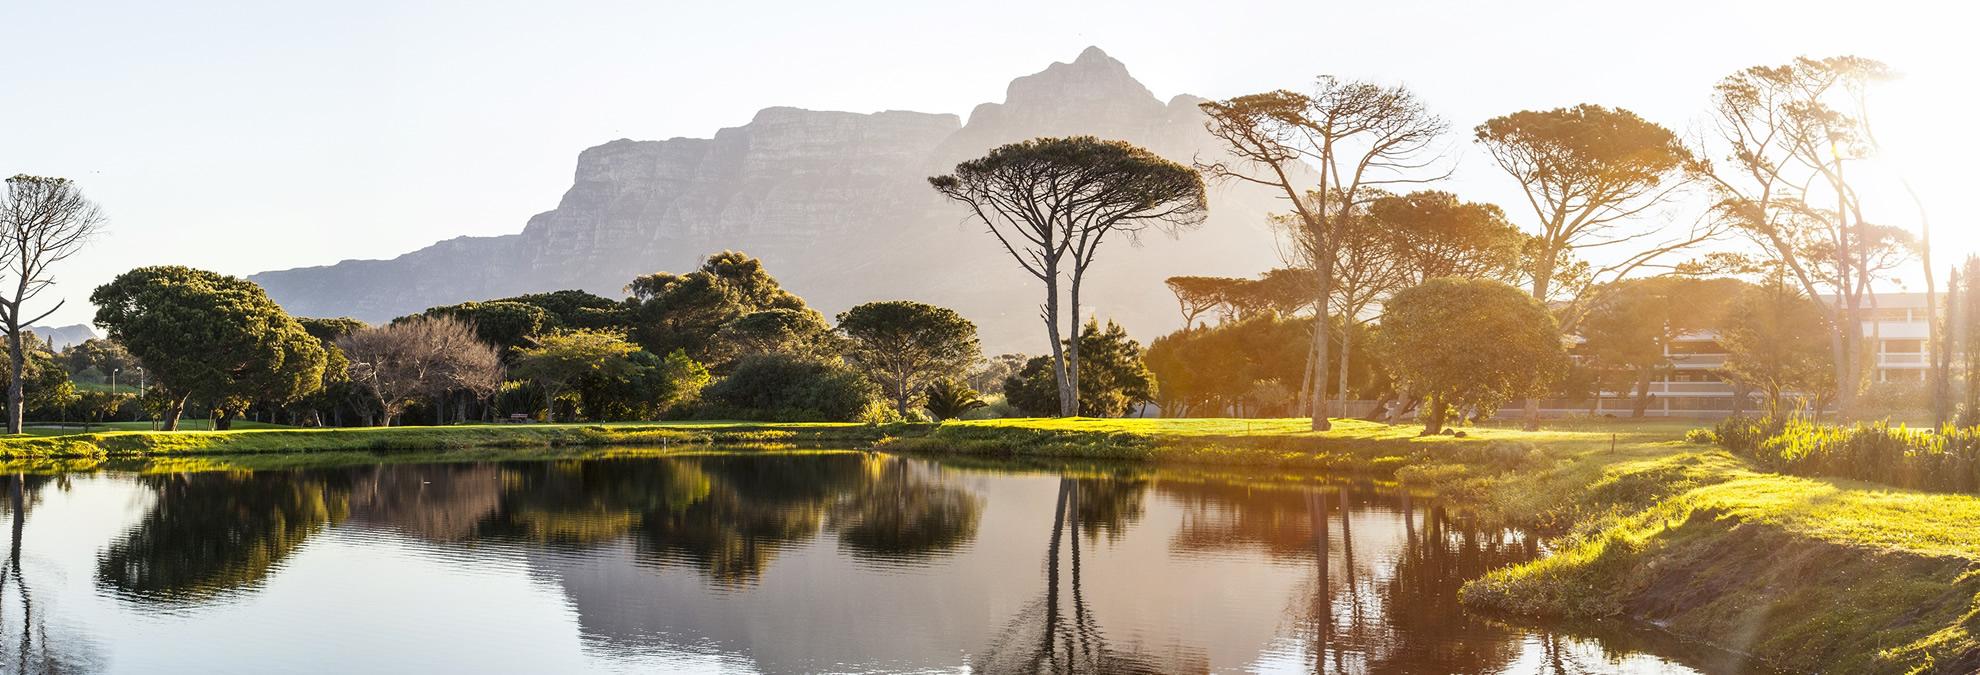 South Africa Field Trip